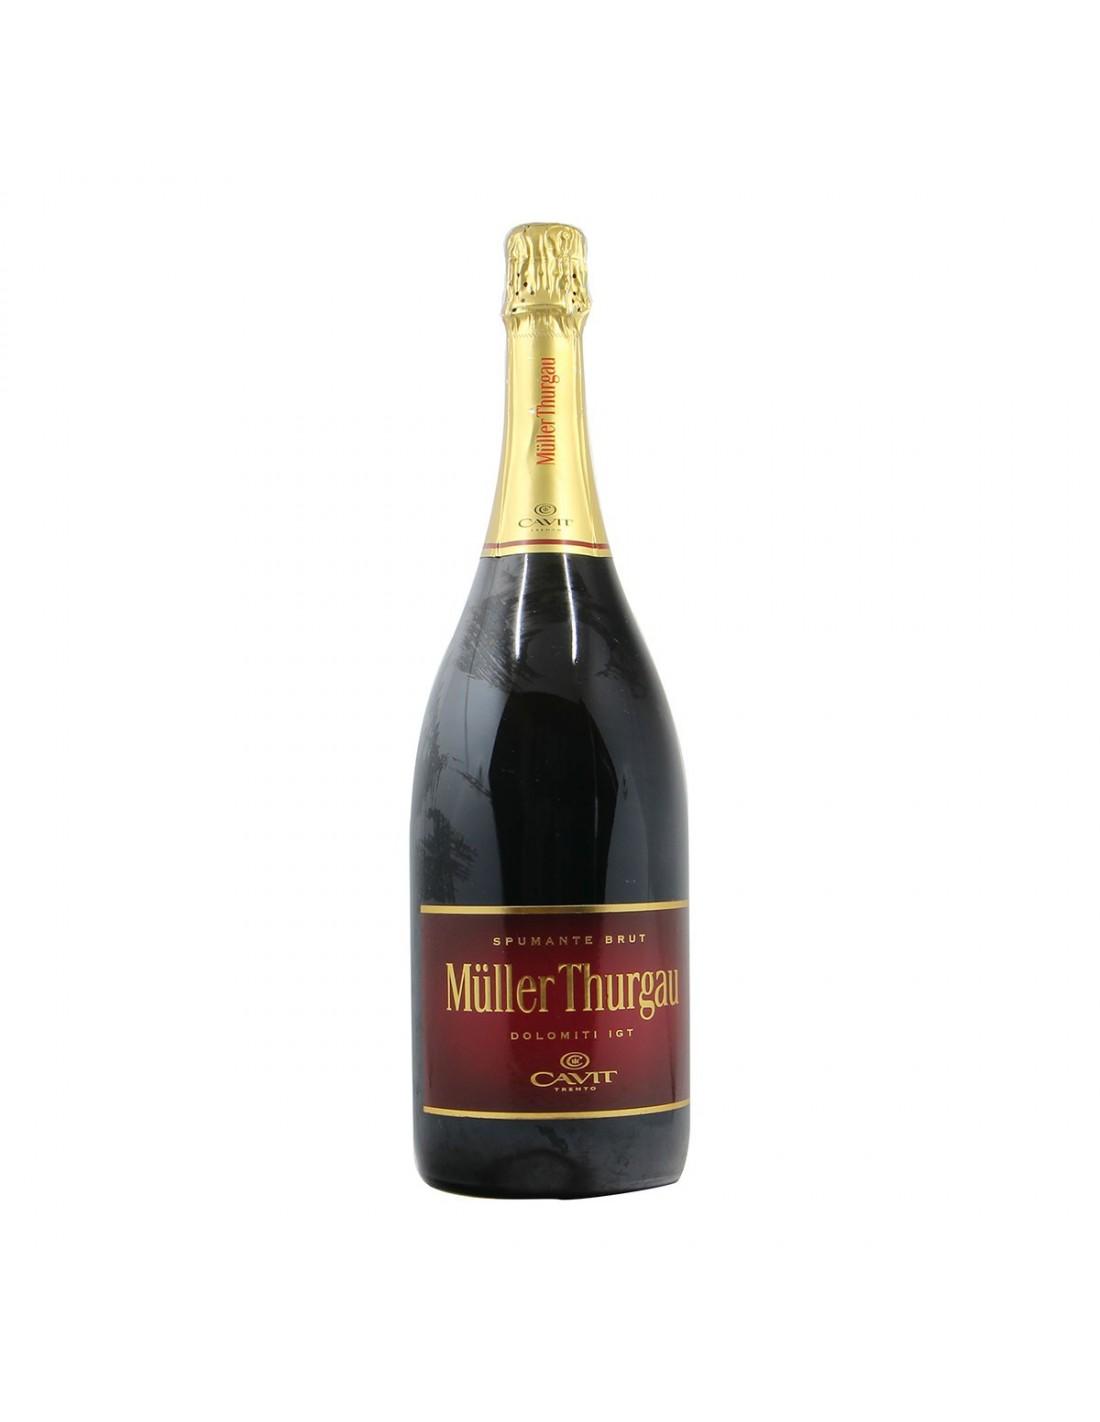 SPUMANTE BRUT MULLER THURGAU MAGNUM NV CAVIT Grandi Bottiglie